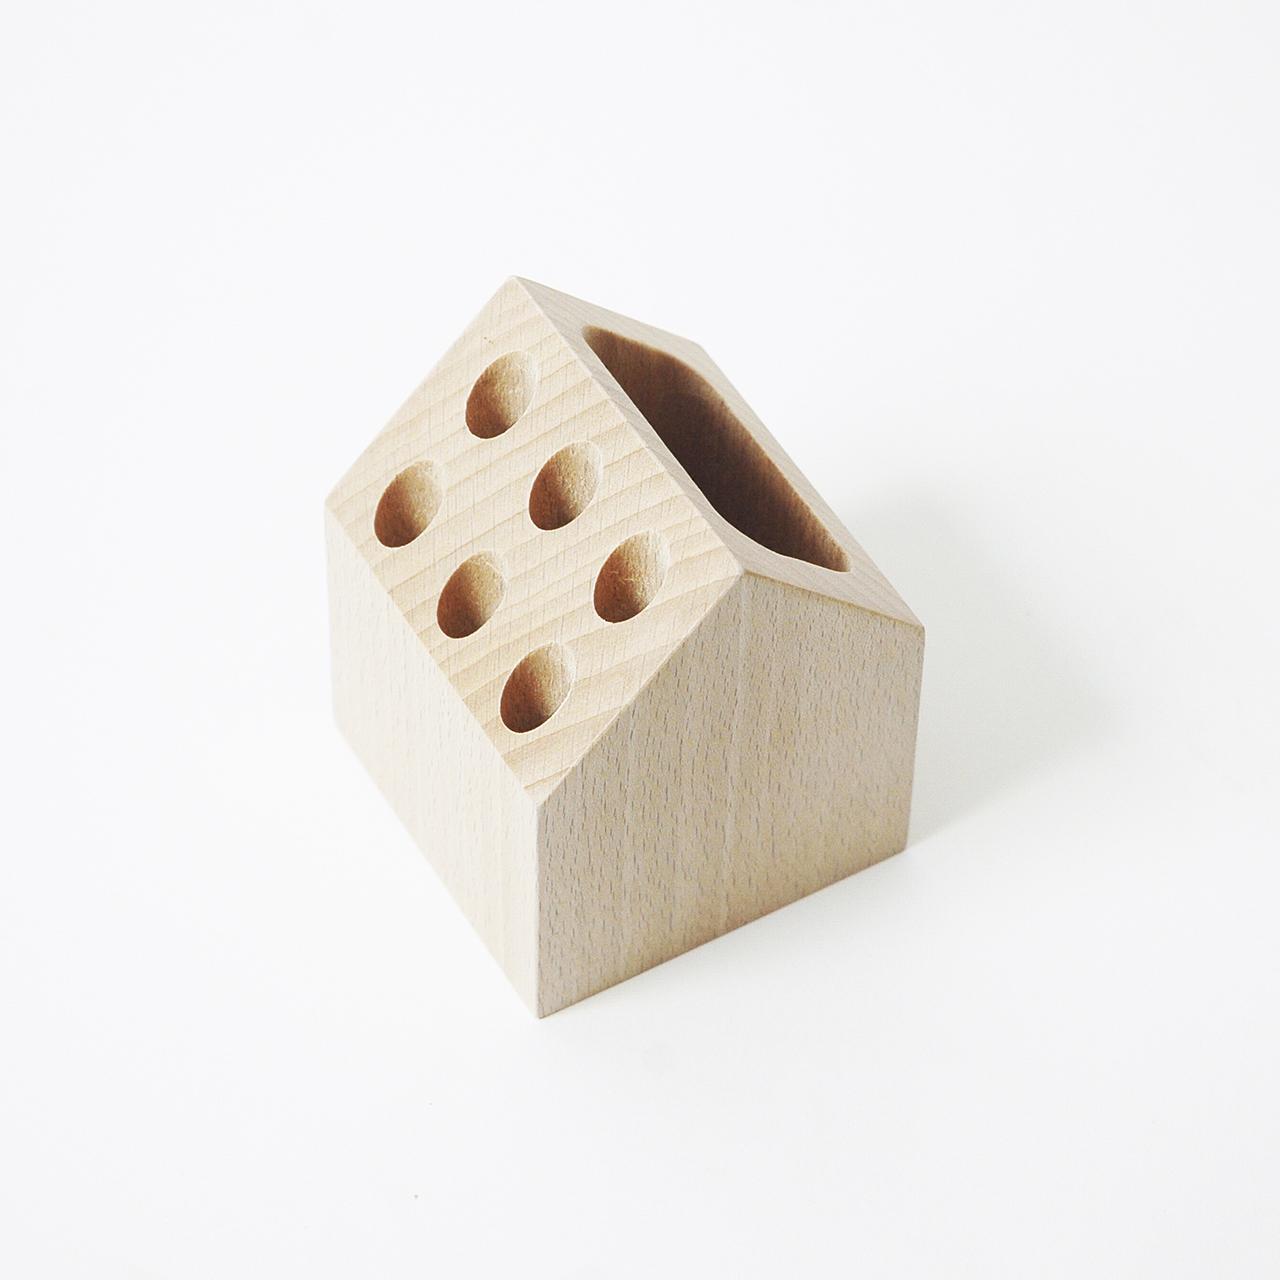 pencil holder, wooden pencil holder, office storage